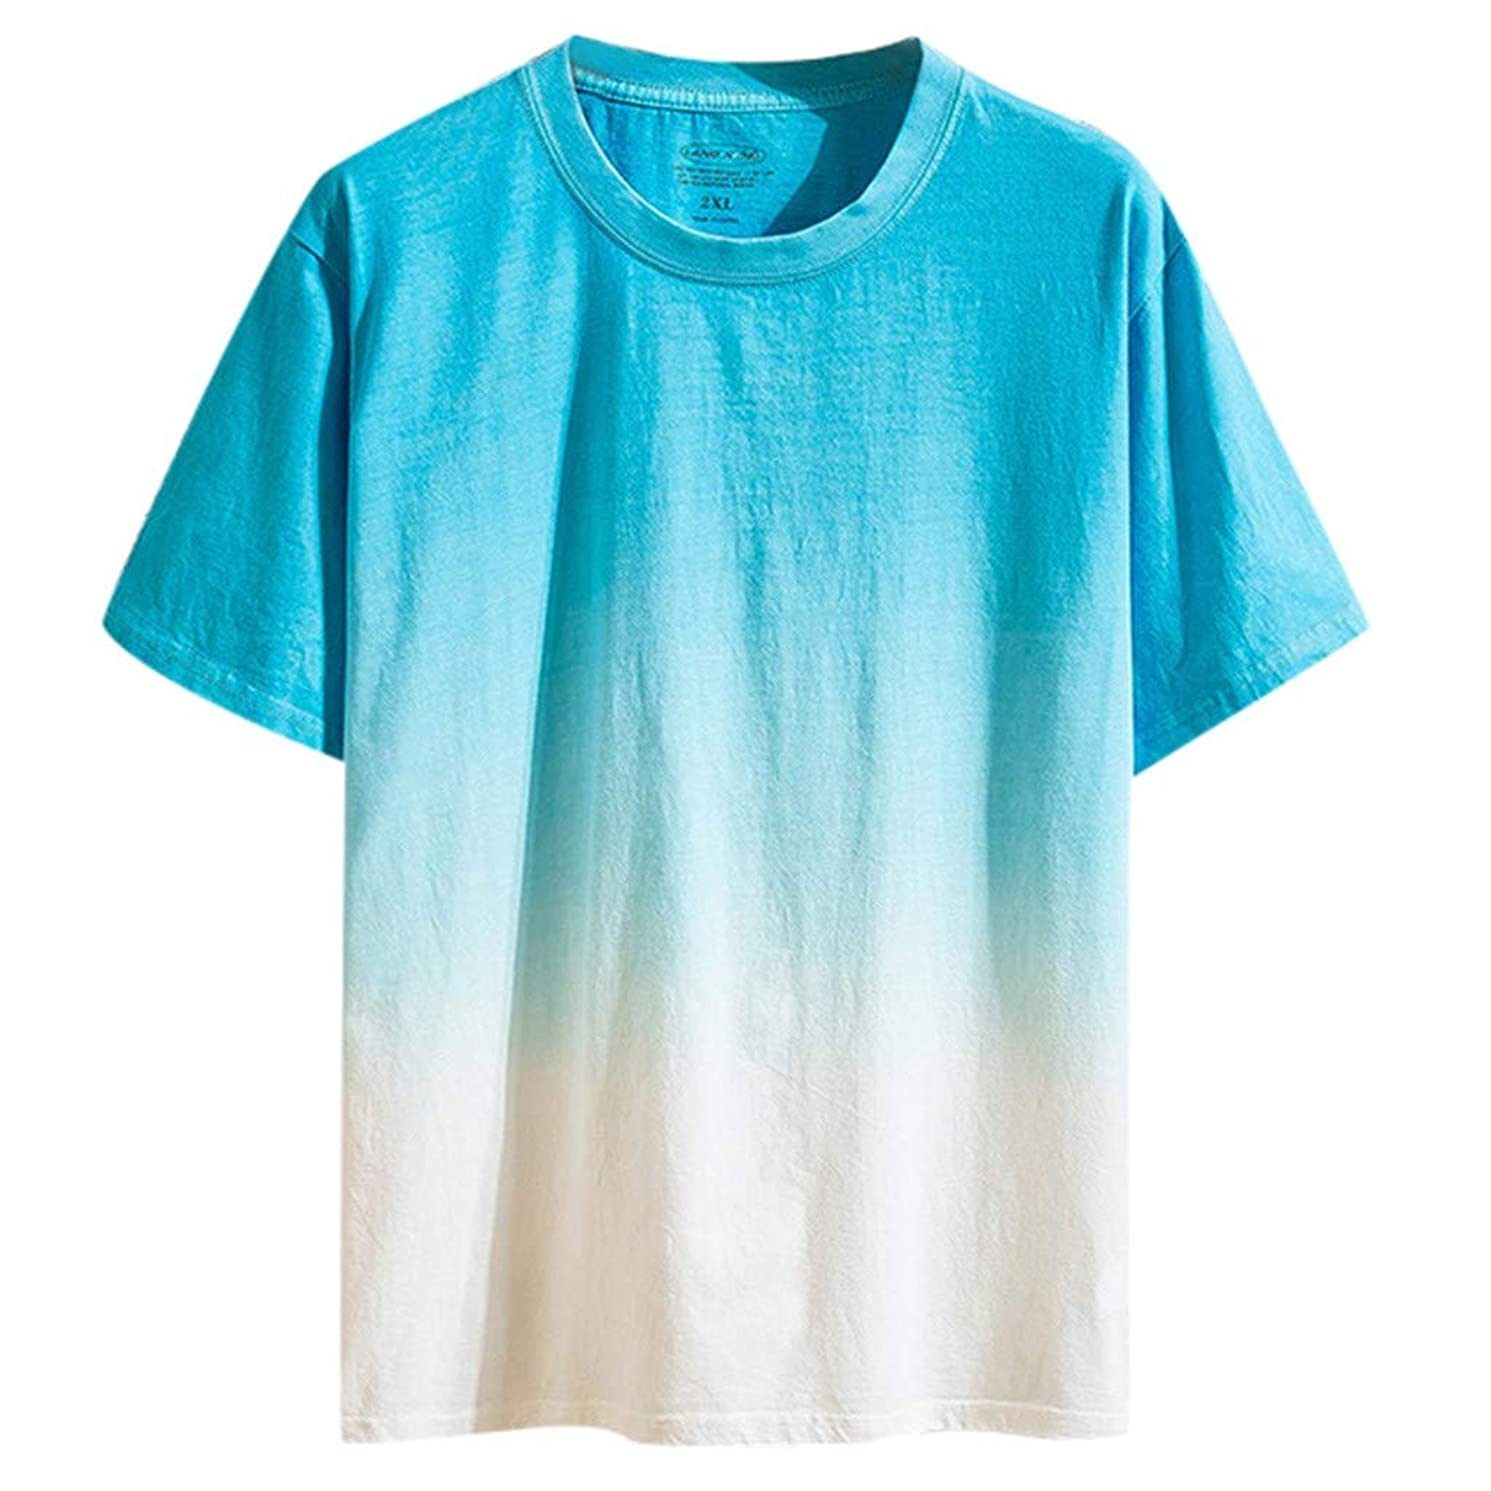 JJLIKER Mens Gradient Color T-Shirt Short Sleeve Tops Hipster Summer Casual Jersey Crewneck Tunic Tees